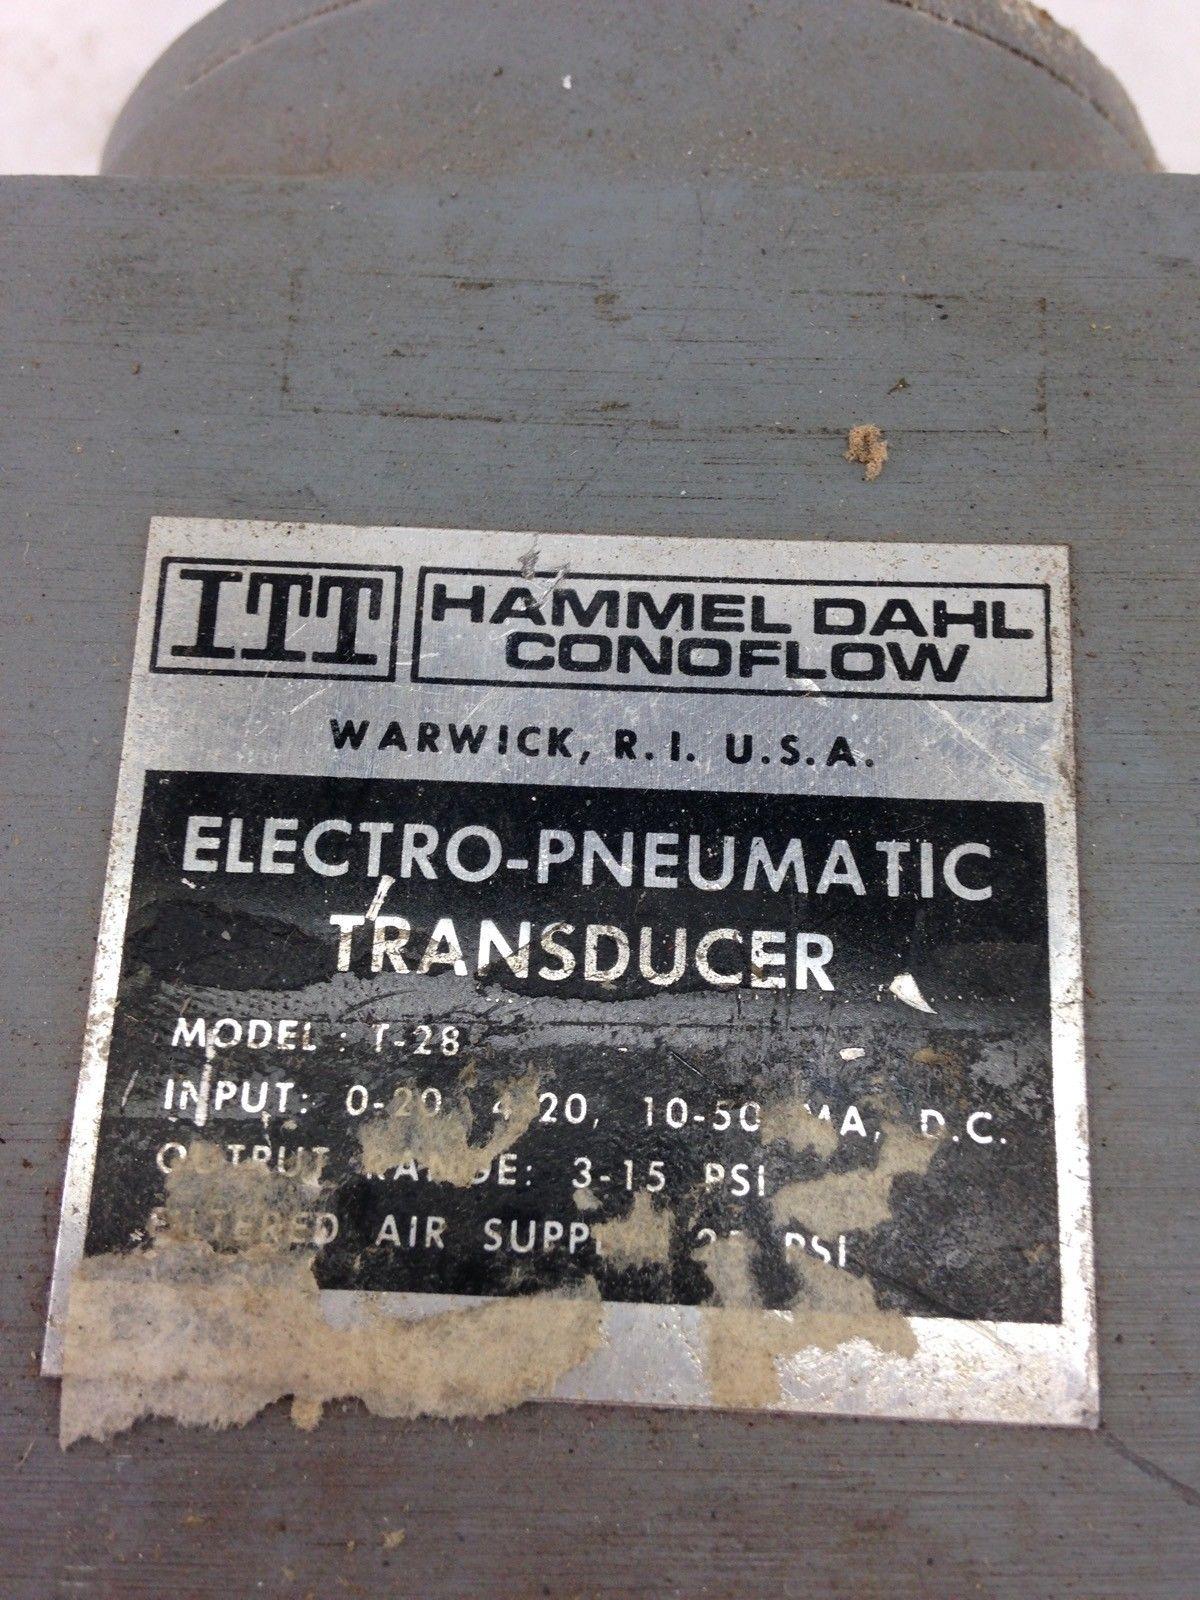 HAMMEL DAHL CONOFLOW T-28 ELECTRO-PNEMATIC TRANSDUCER (B443) 2